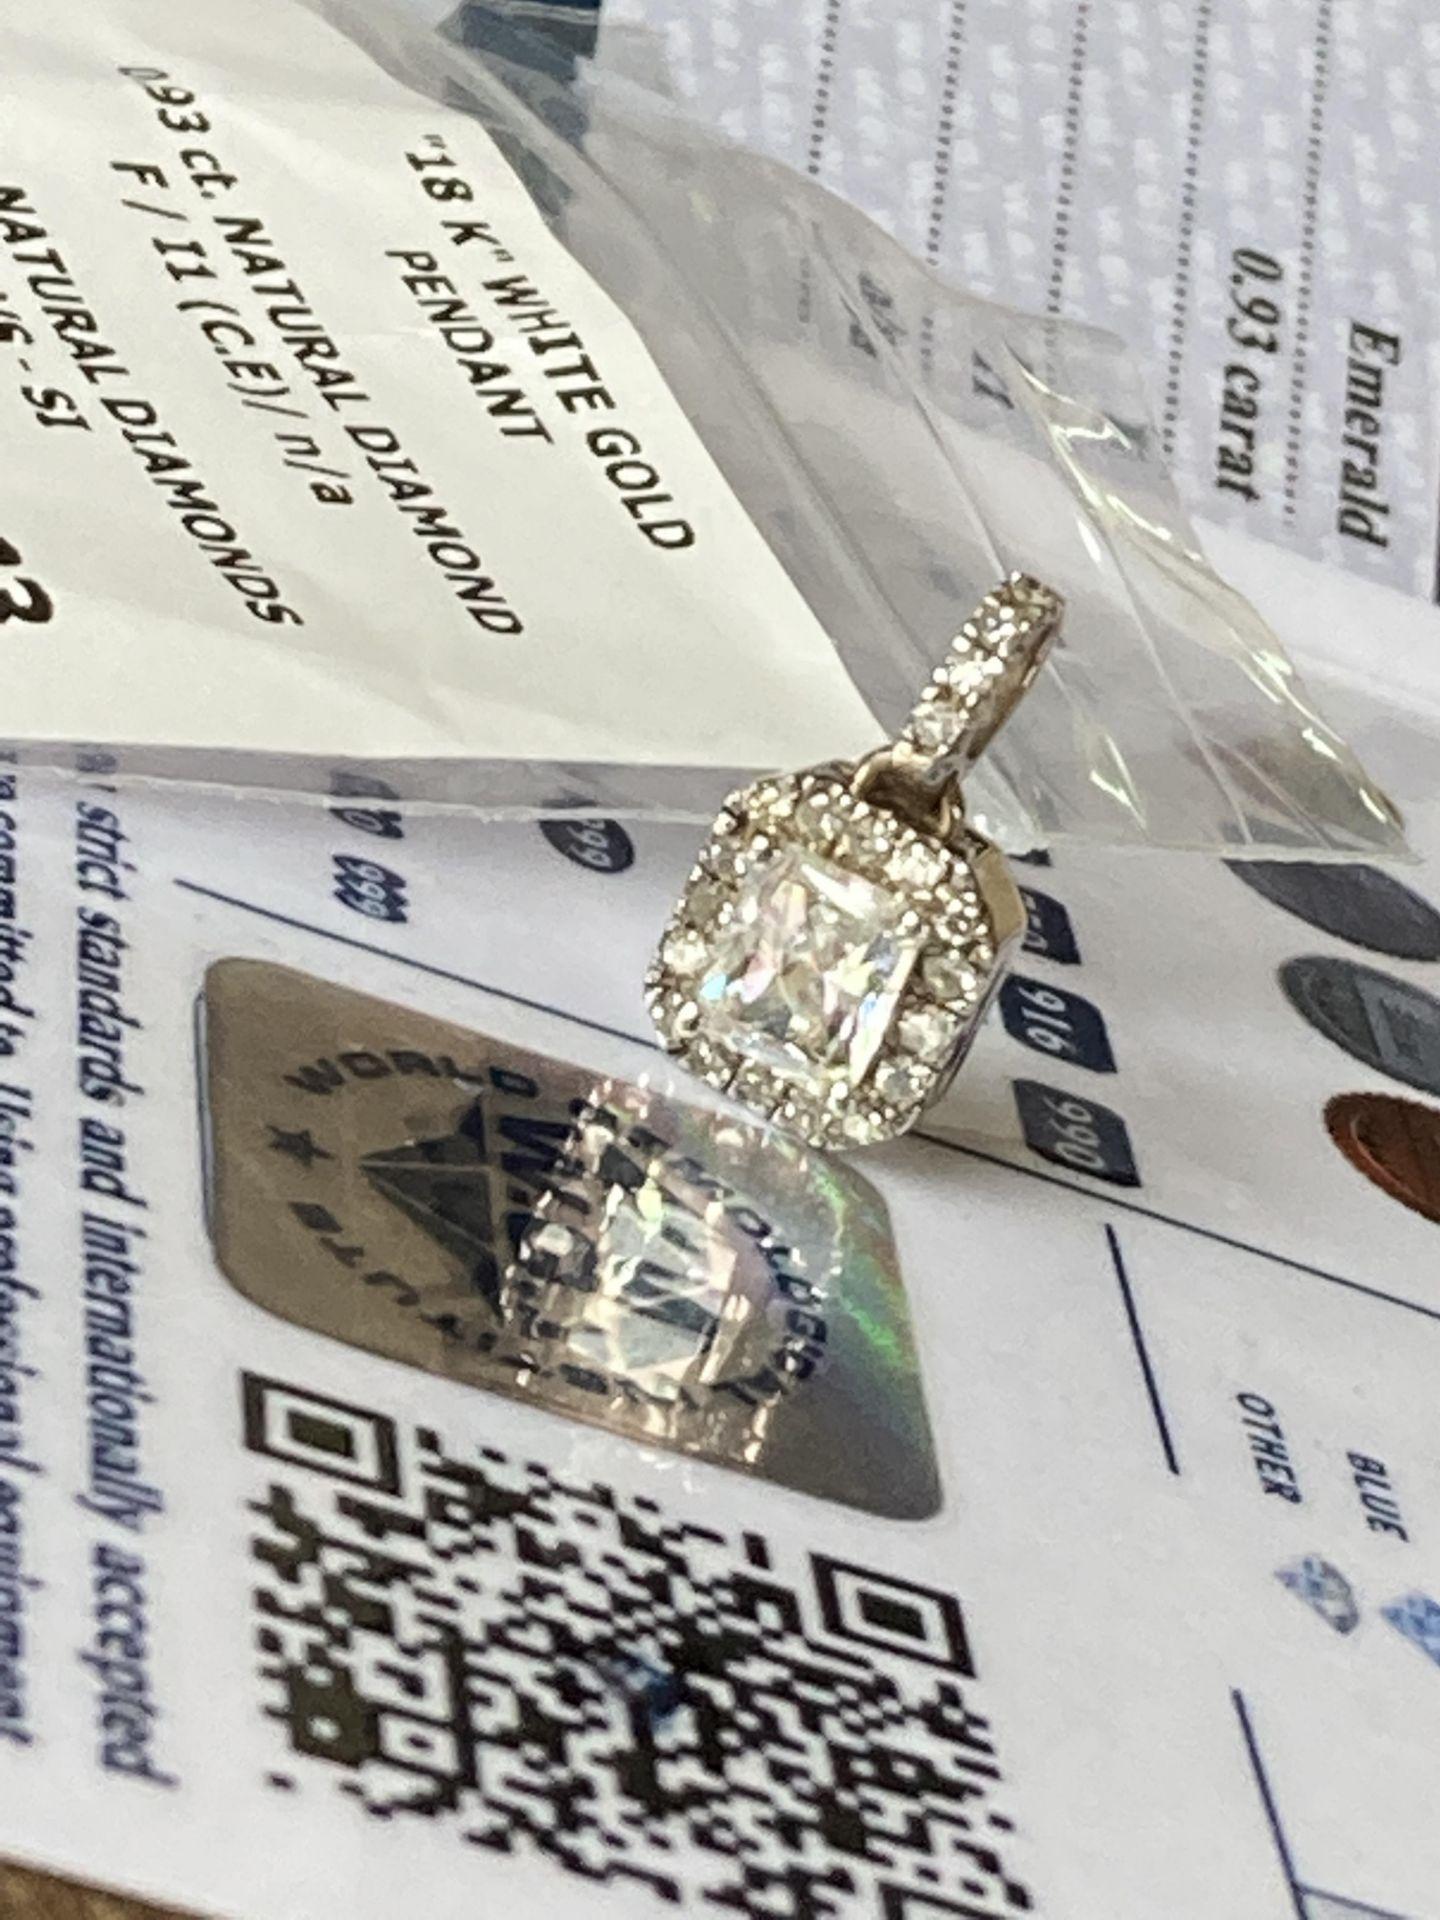 1.05CT DIAMOND PENDANT - 18K WHITE GOLD (WGI CERTIFICATE) - Image 2 of 5